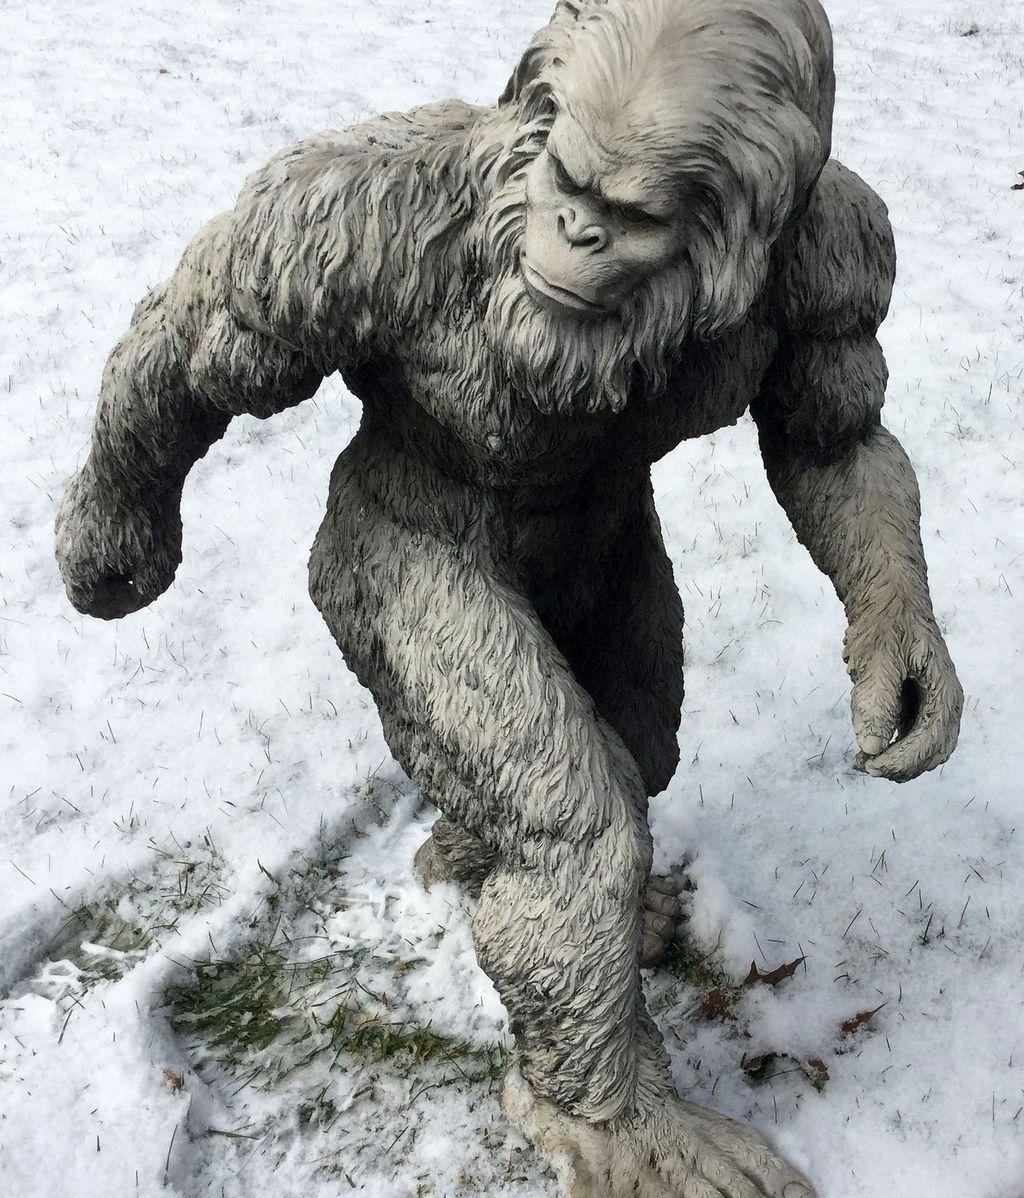 bigfoot-1620140_1920